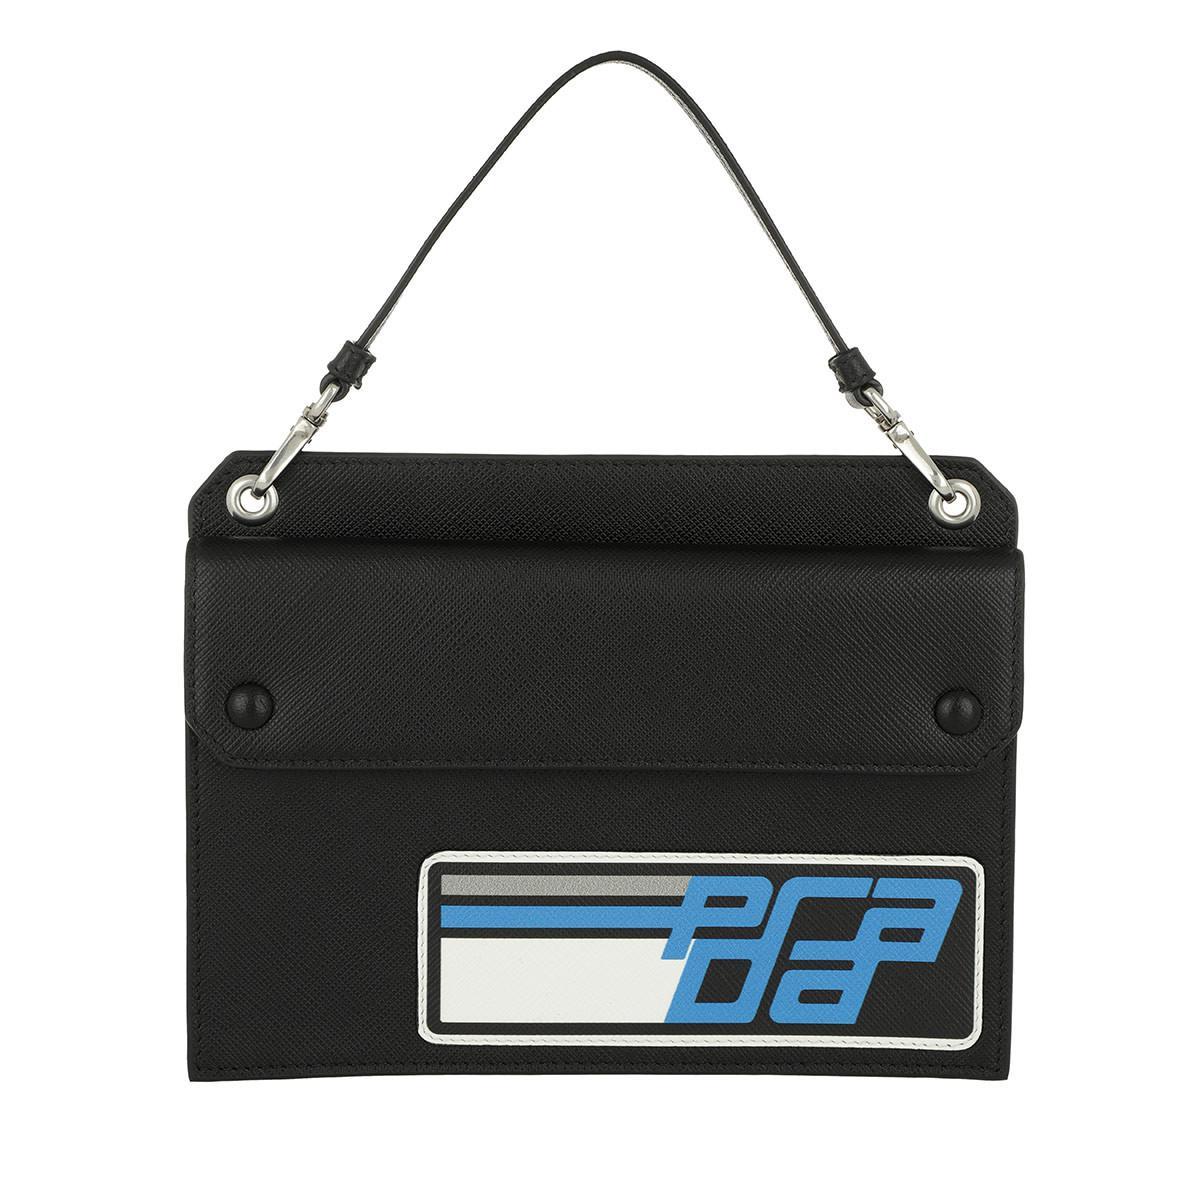 e5d3437981ed Prada Logo Mini Bag Leather Black blue in Black - Lyst